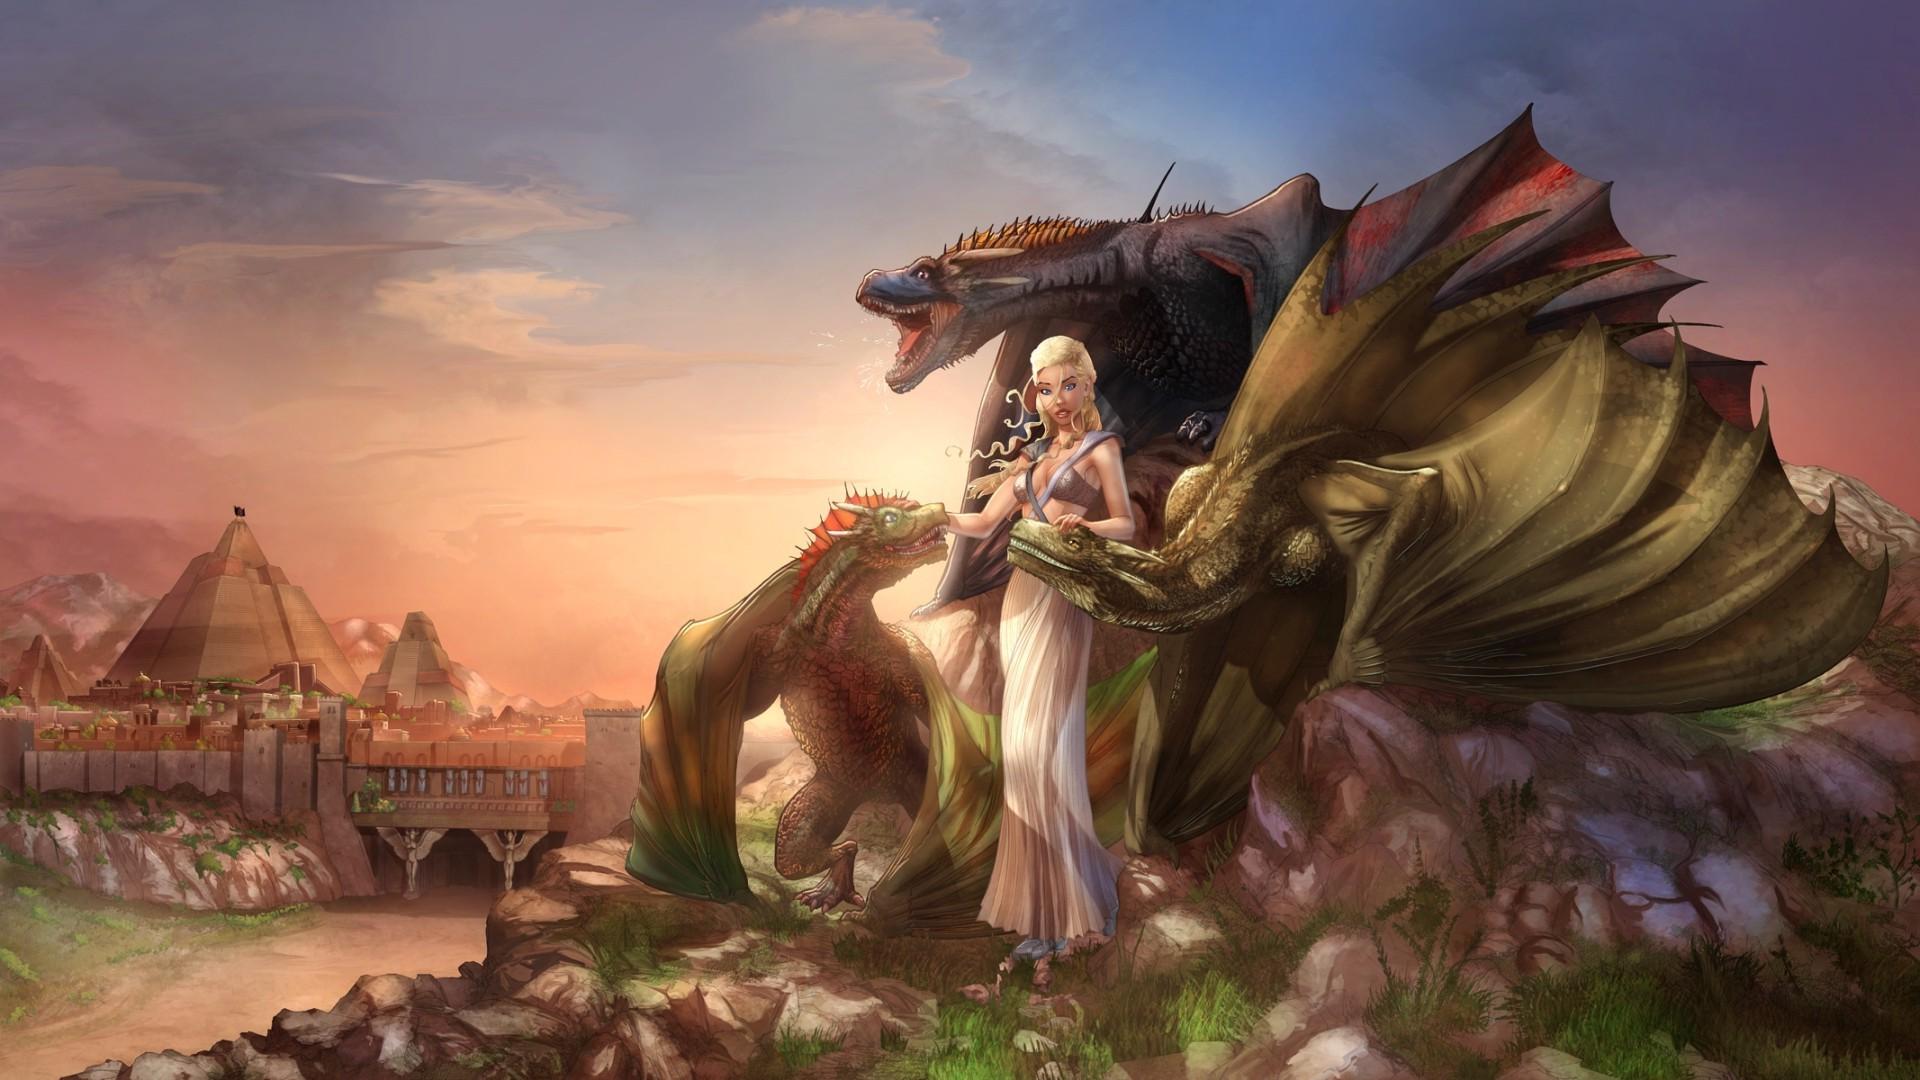 Wallpaper Fantasy Art Dragon Fan Art Game Of Thrones Mythology